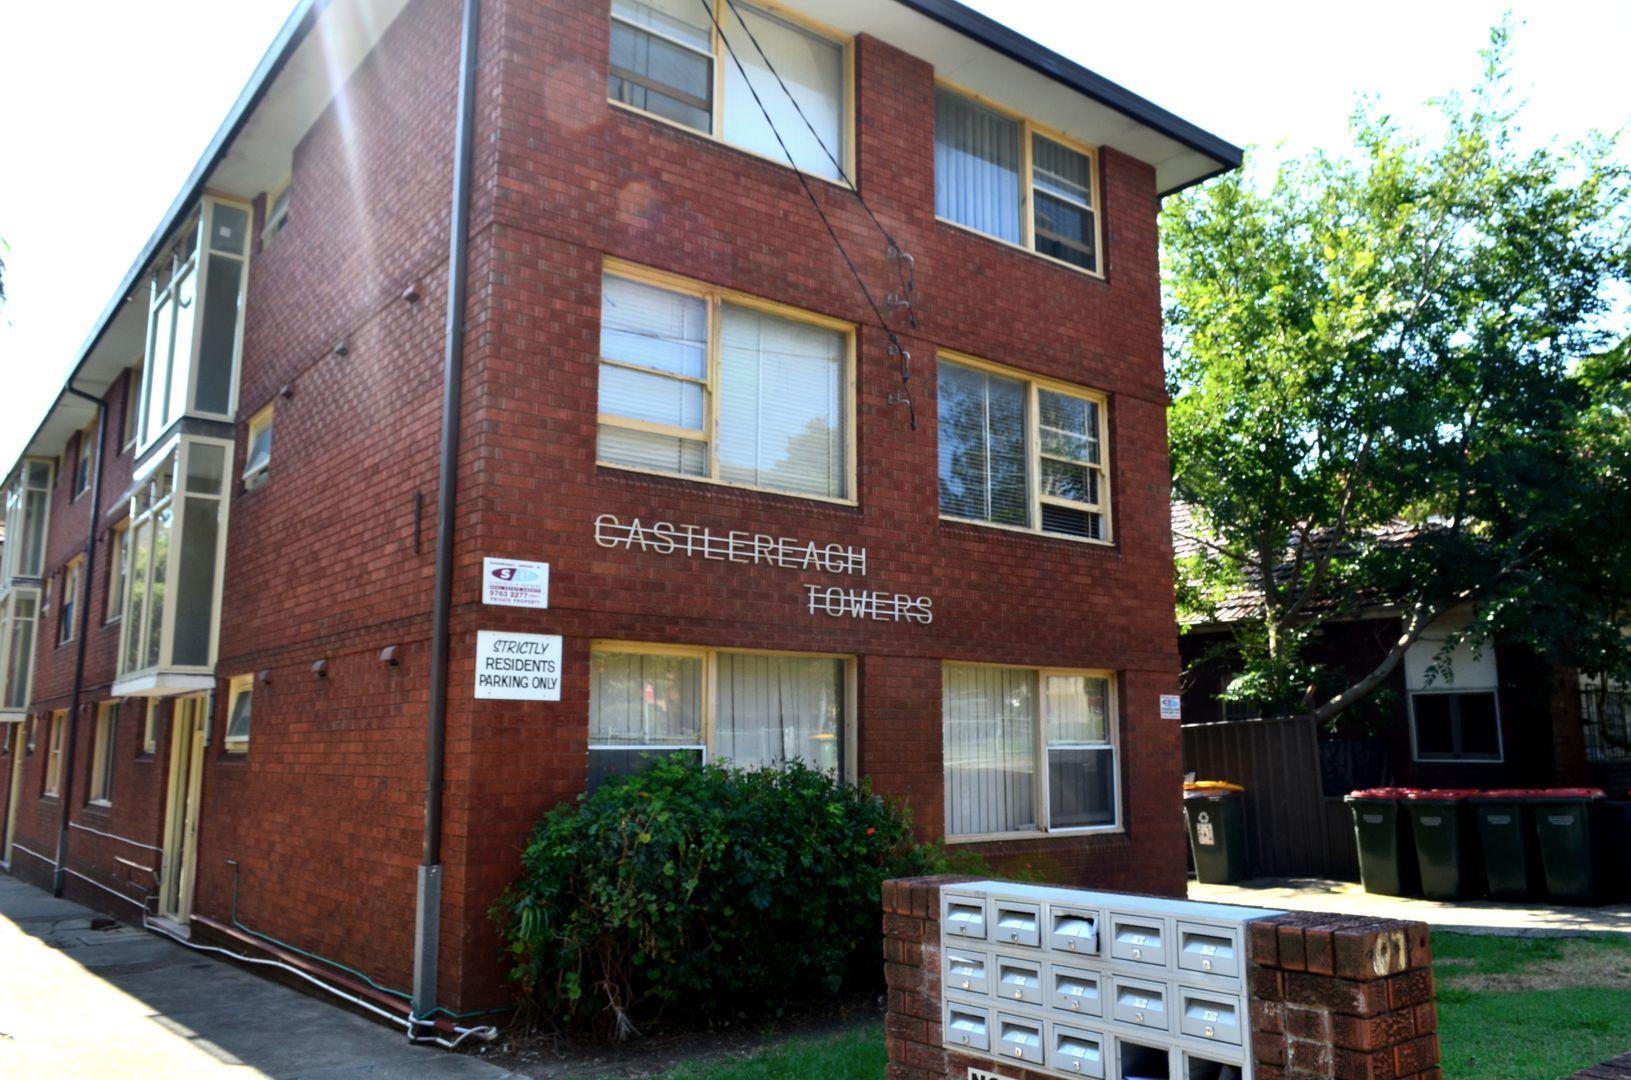 2/67 WENTWORTH ROAD, Strathfield NSW 2135, Image 0